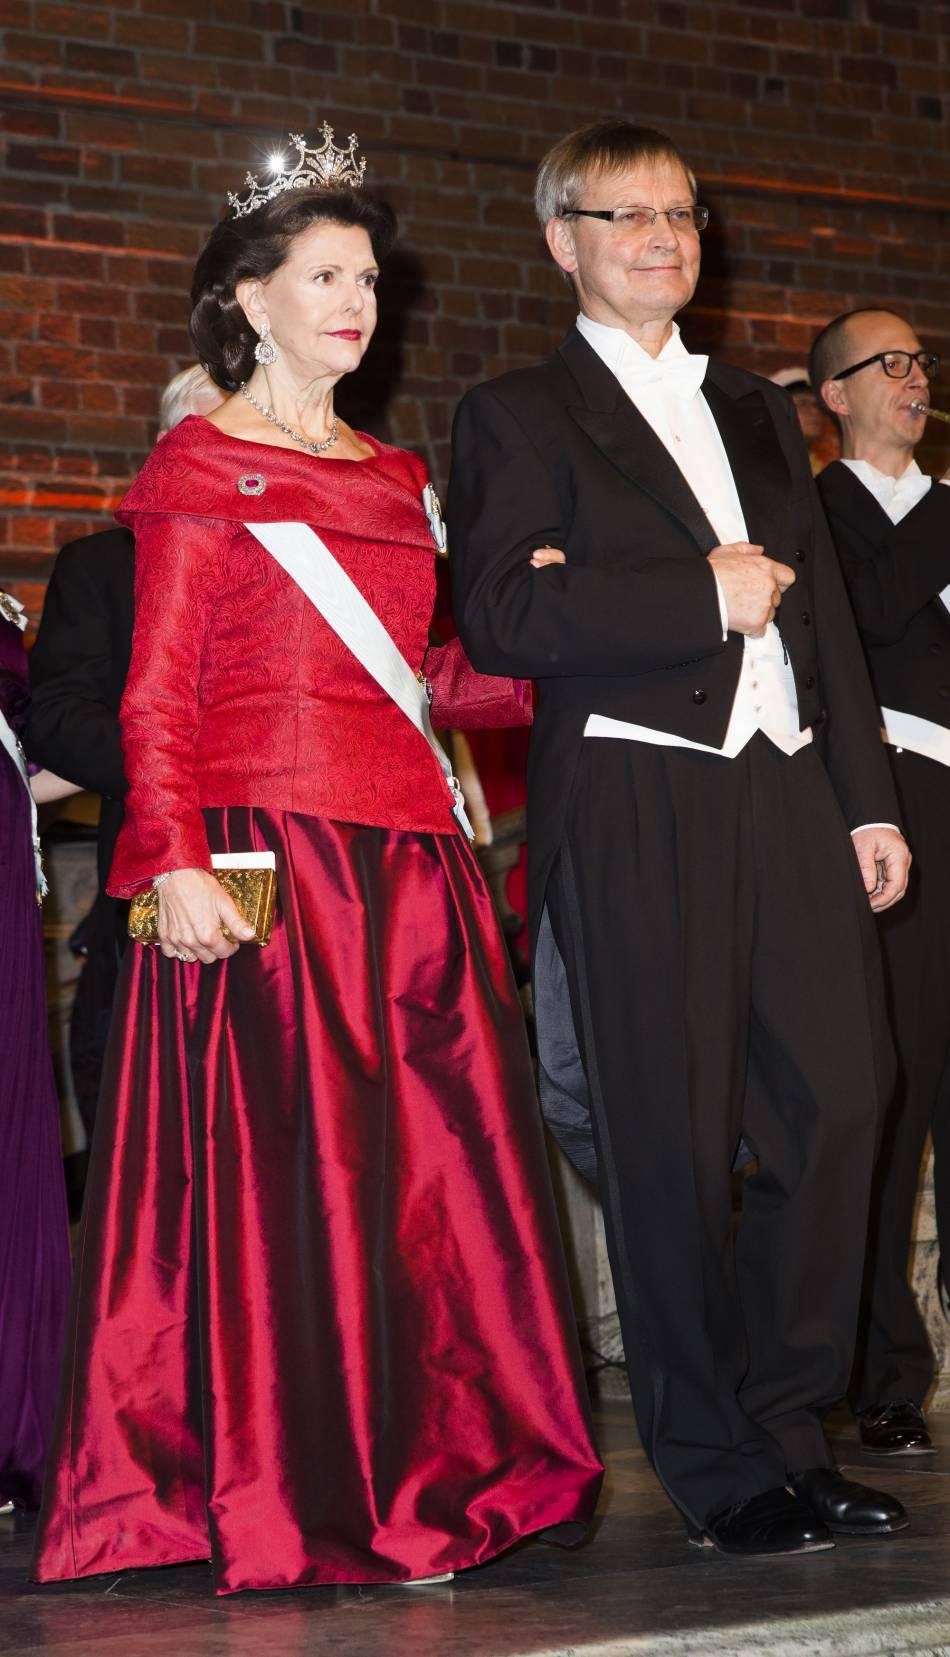 On verra aussi la reine Silvia en voyage au Vatican.